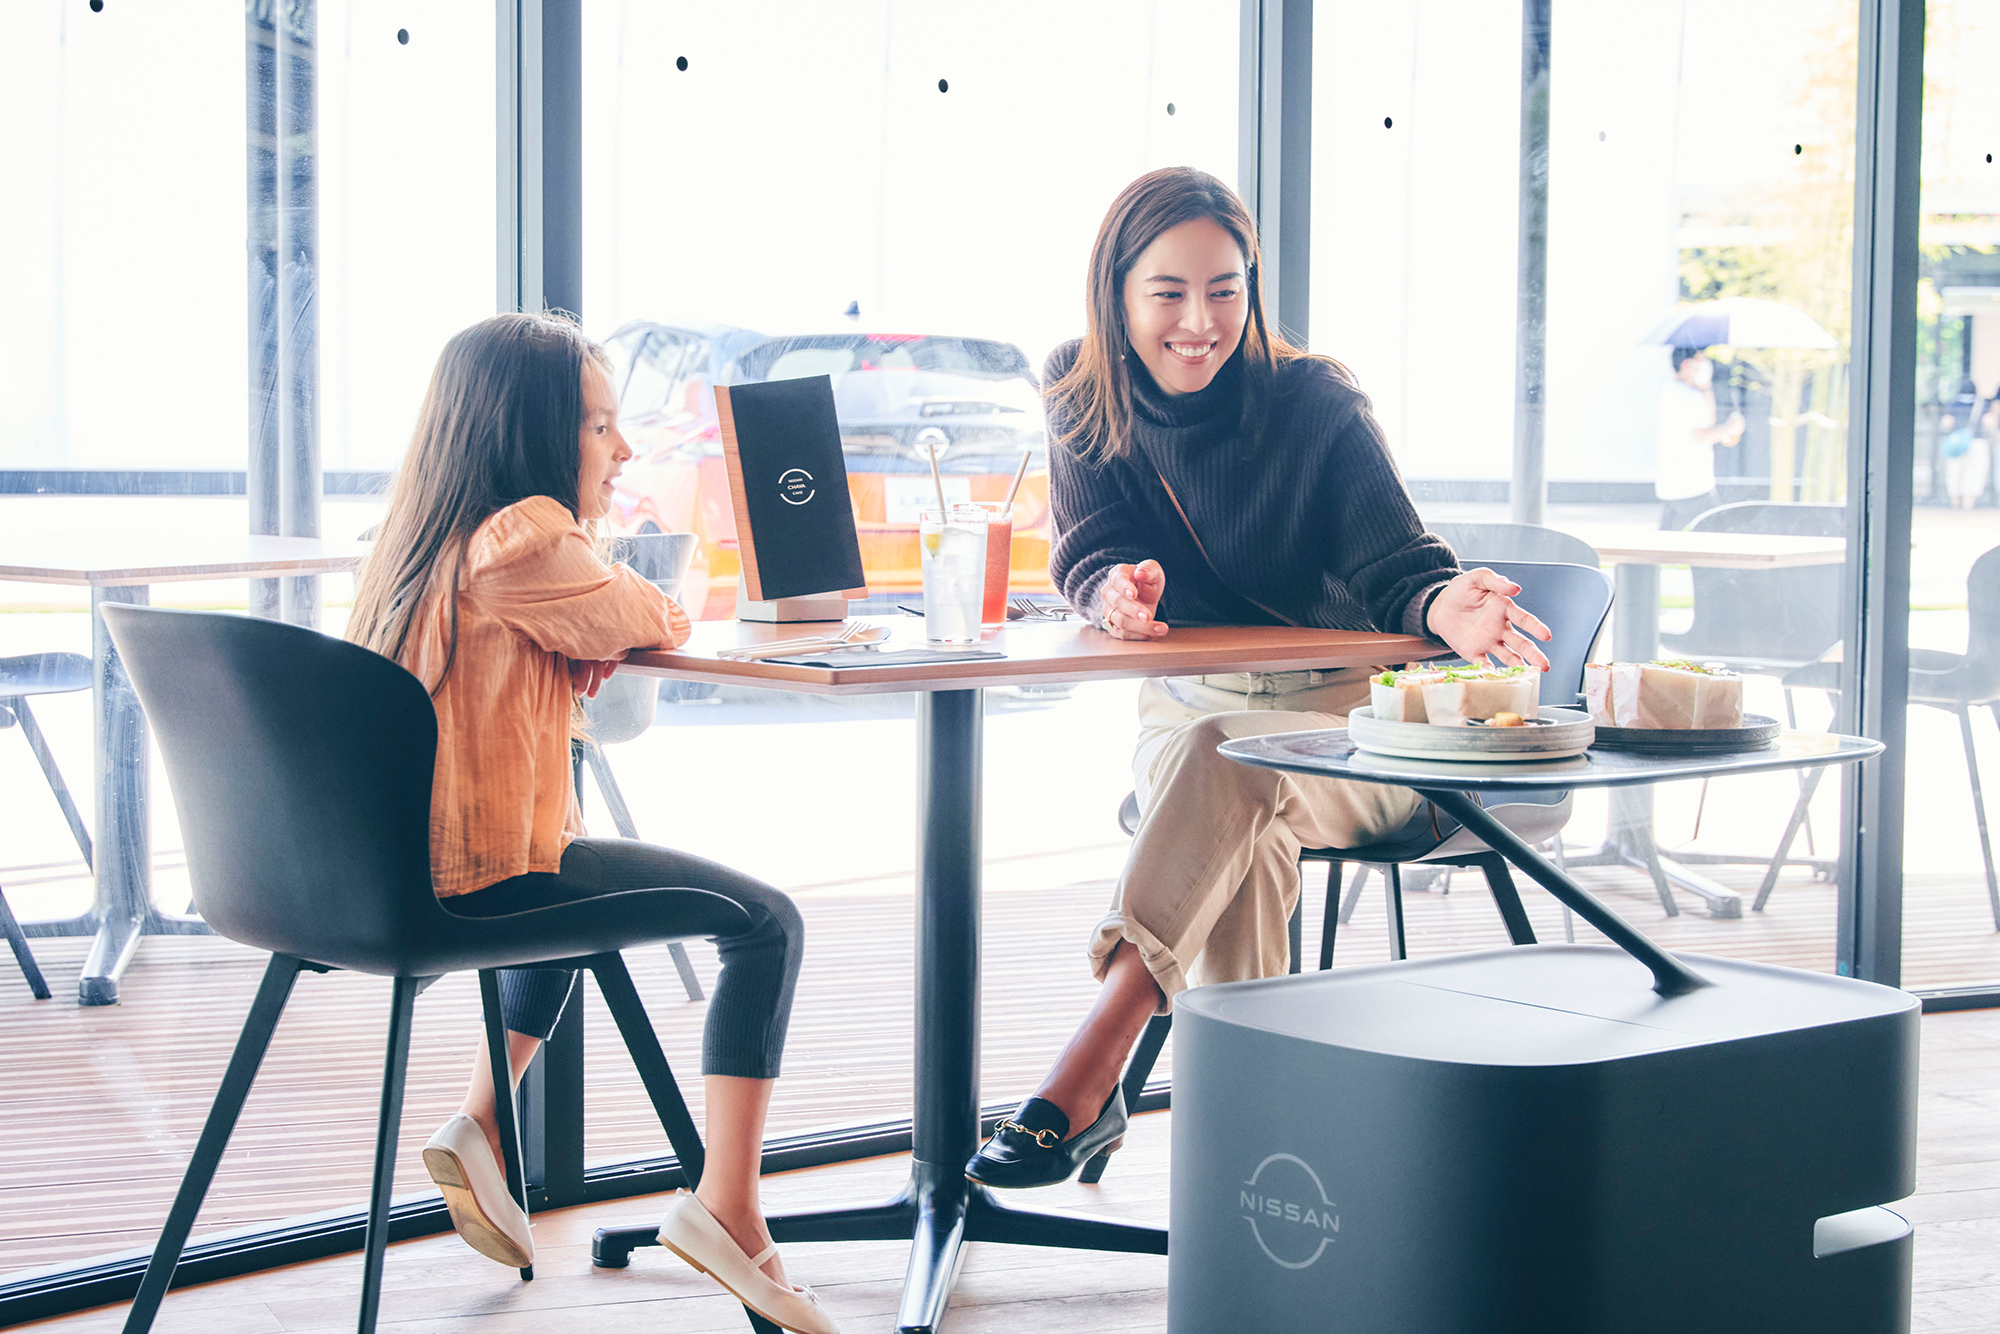 NISSAN CHAYA CAFE